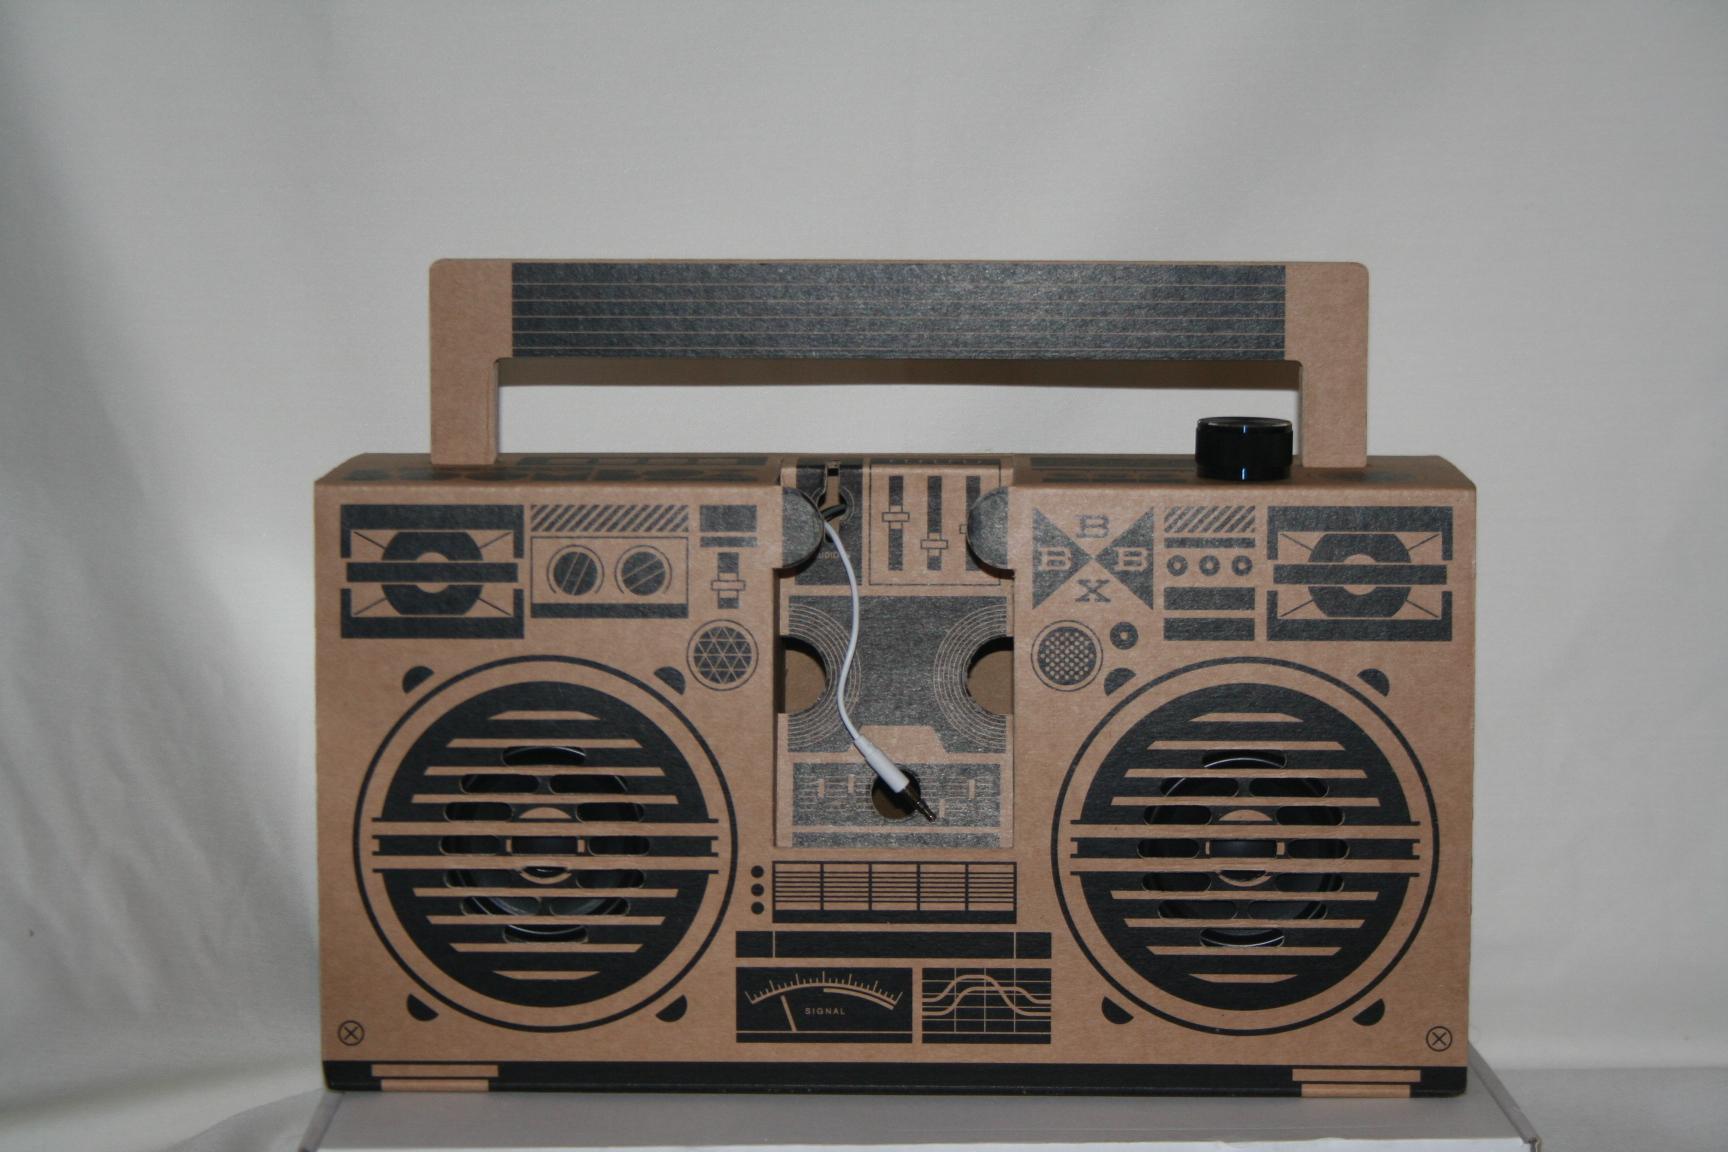 fp1387-berlin-boombox2